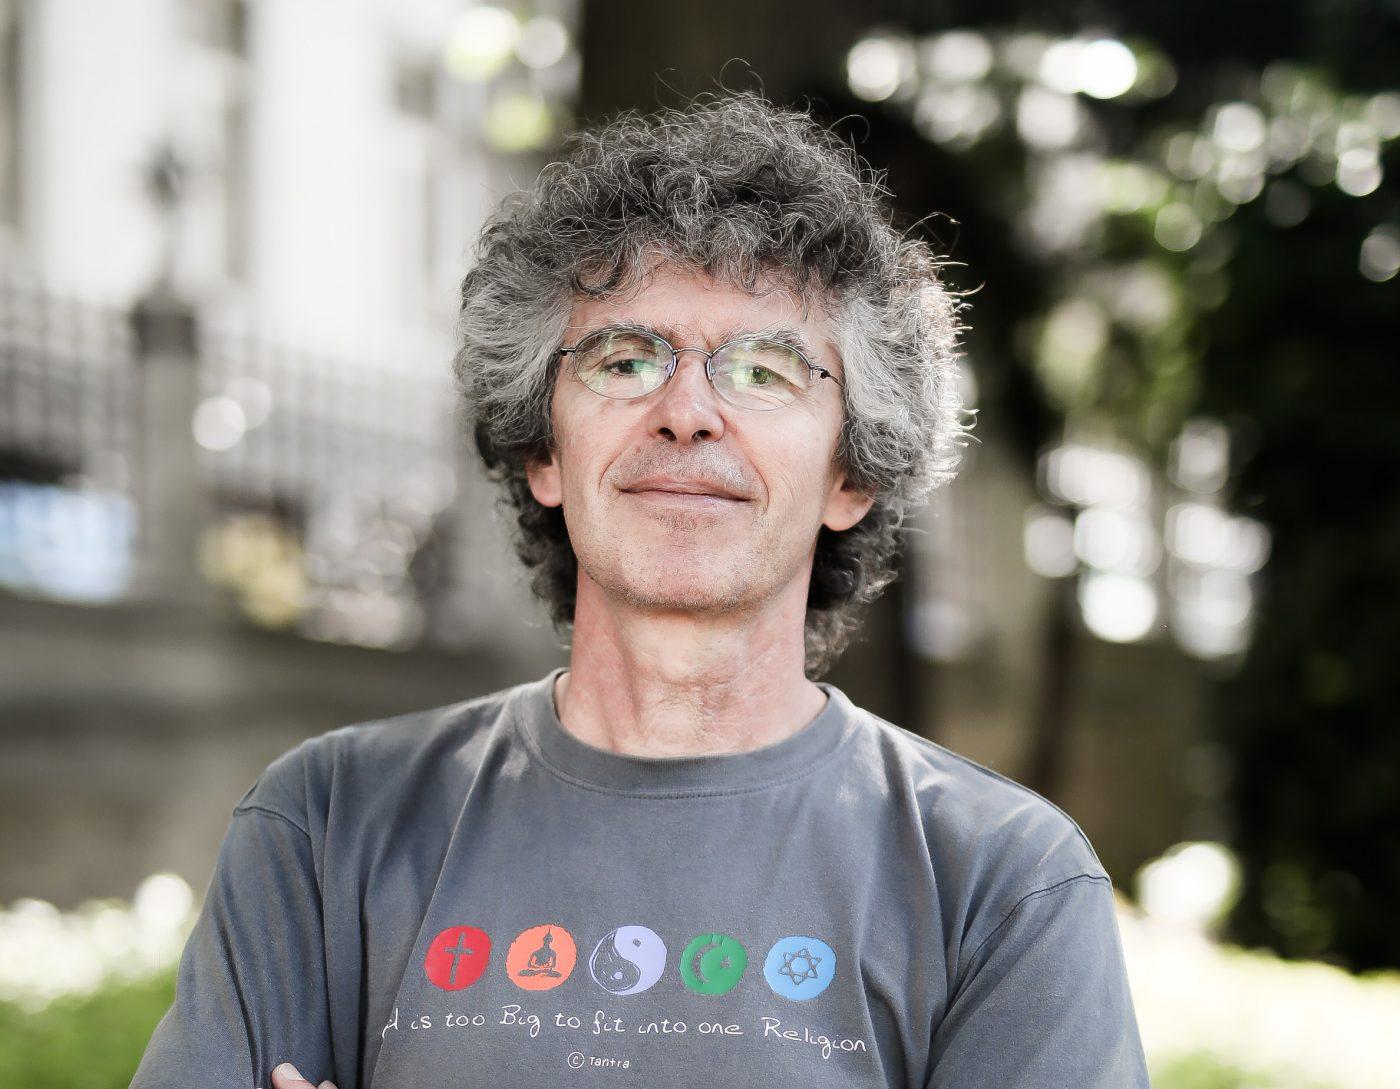 François Vandercam